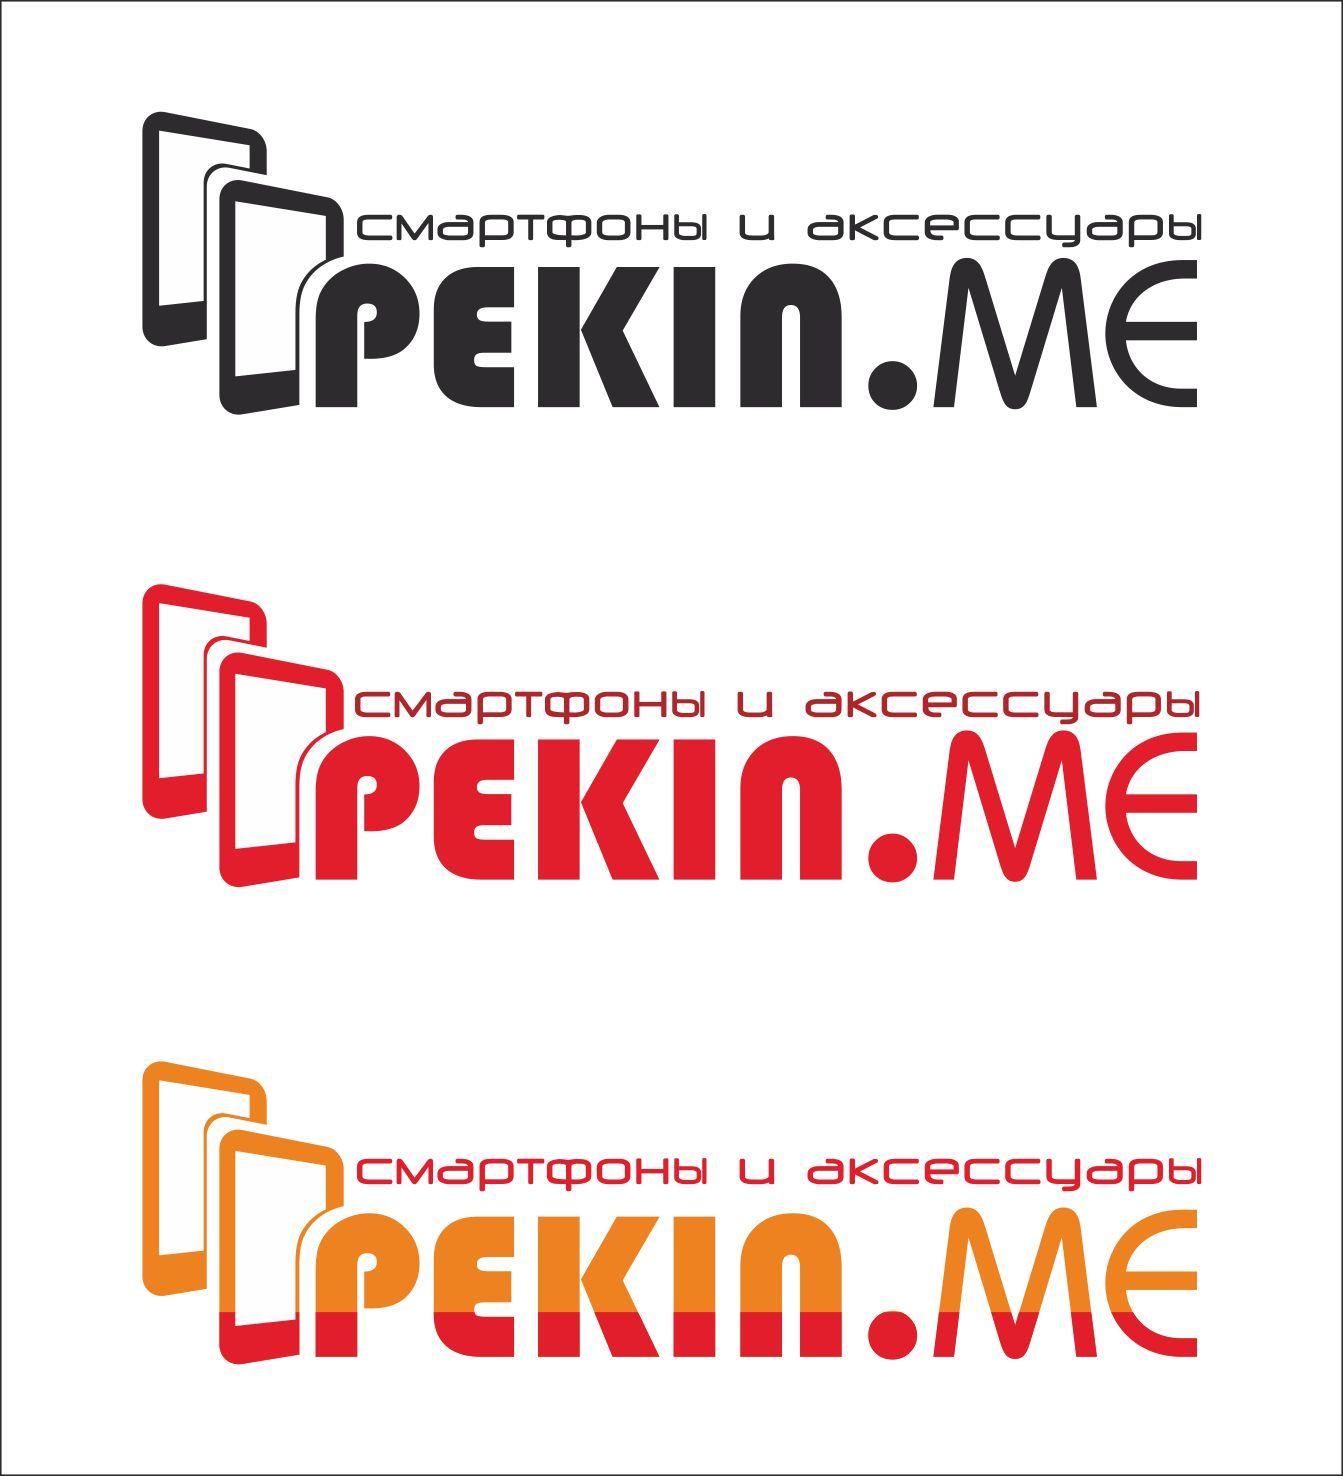 Логотип для компании pekin.me - дизайнер polehin83